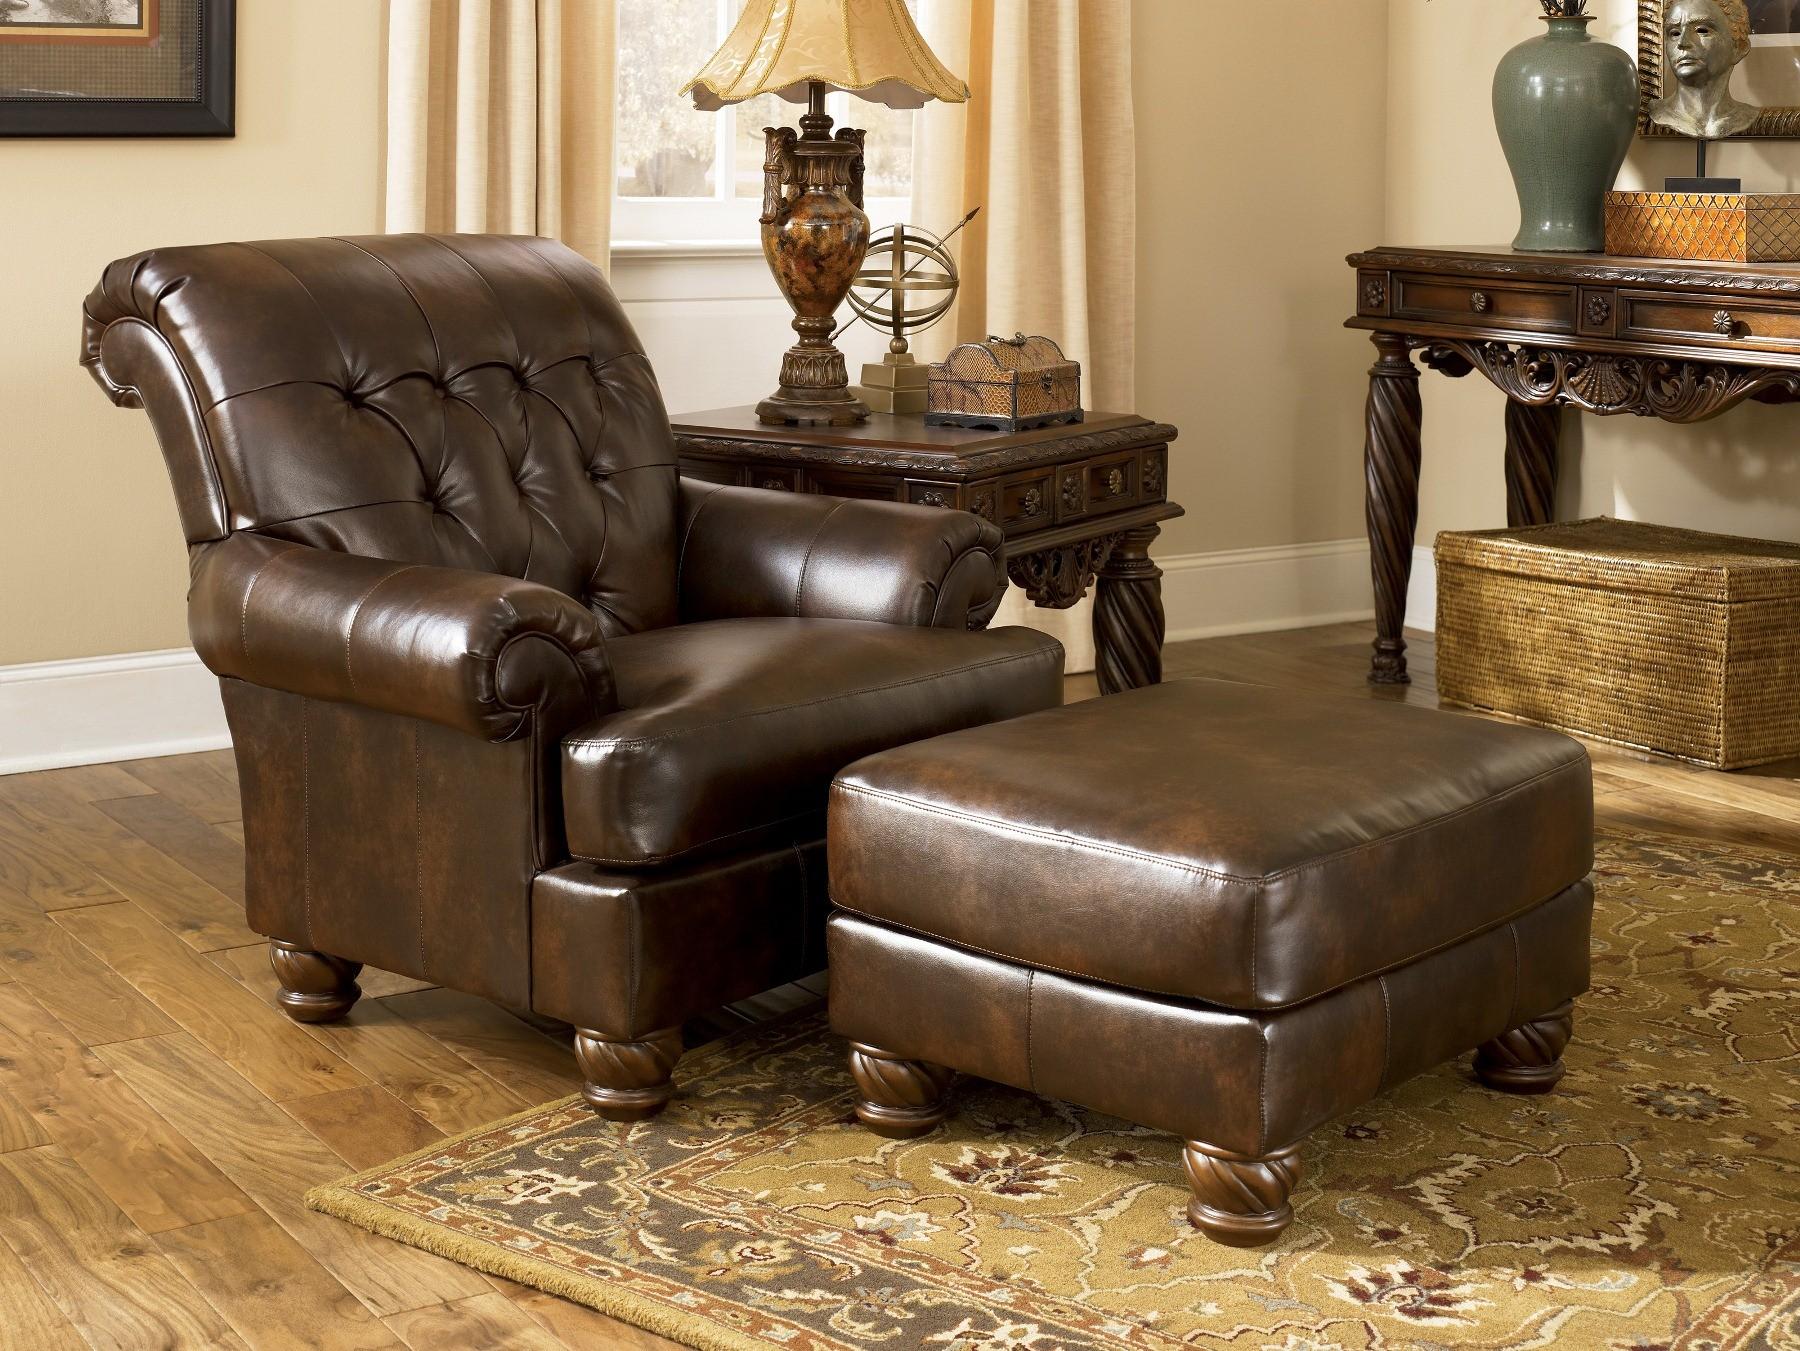 Fresco DuraBlend Antique Sofa & Chair Living Room Set ...